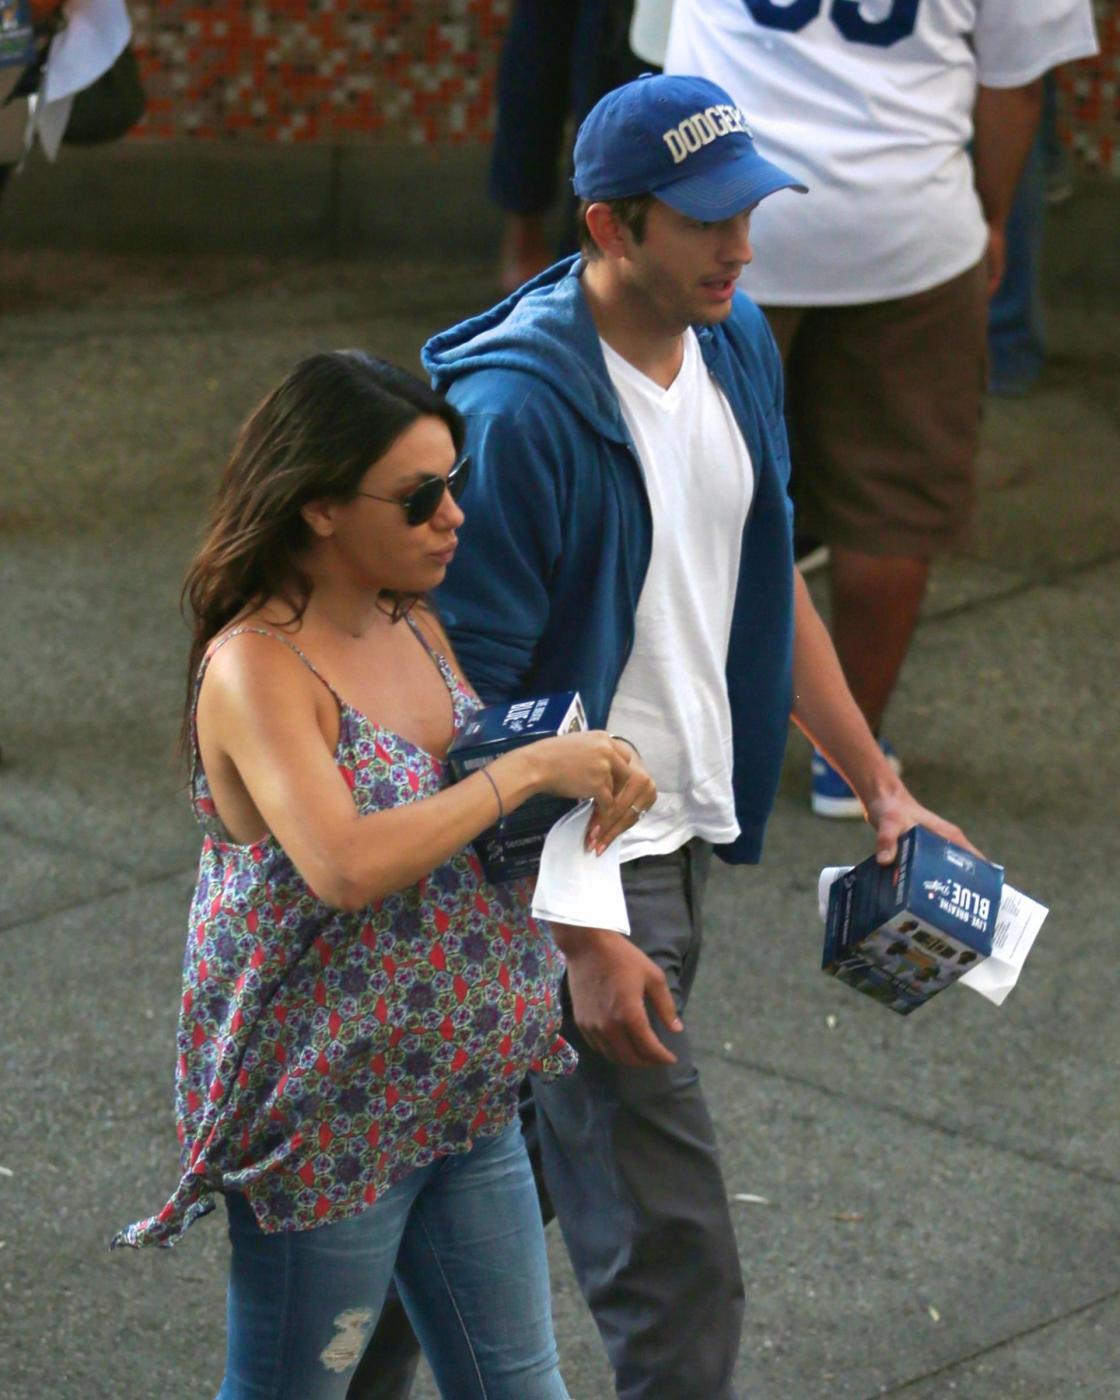 Mila Kunis e Ashton Kutcher insieme allo stadio (foto)